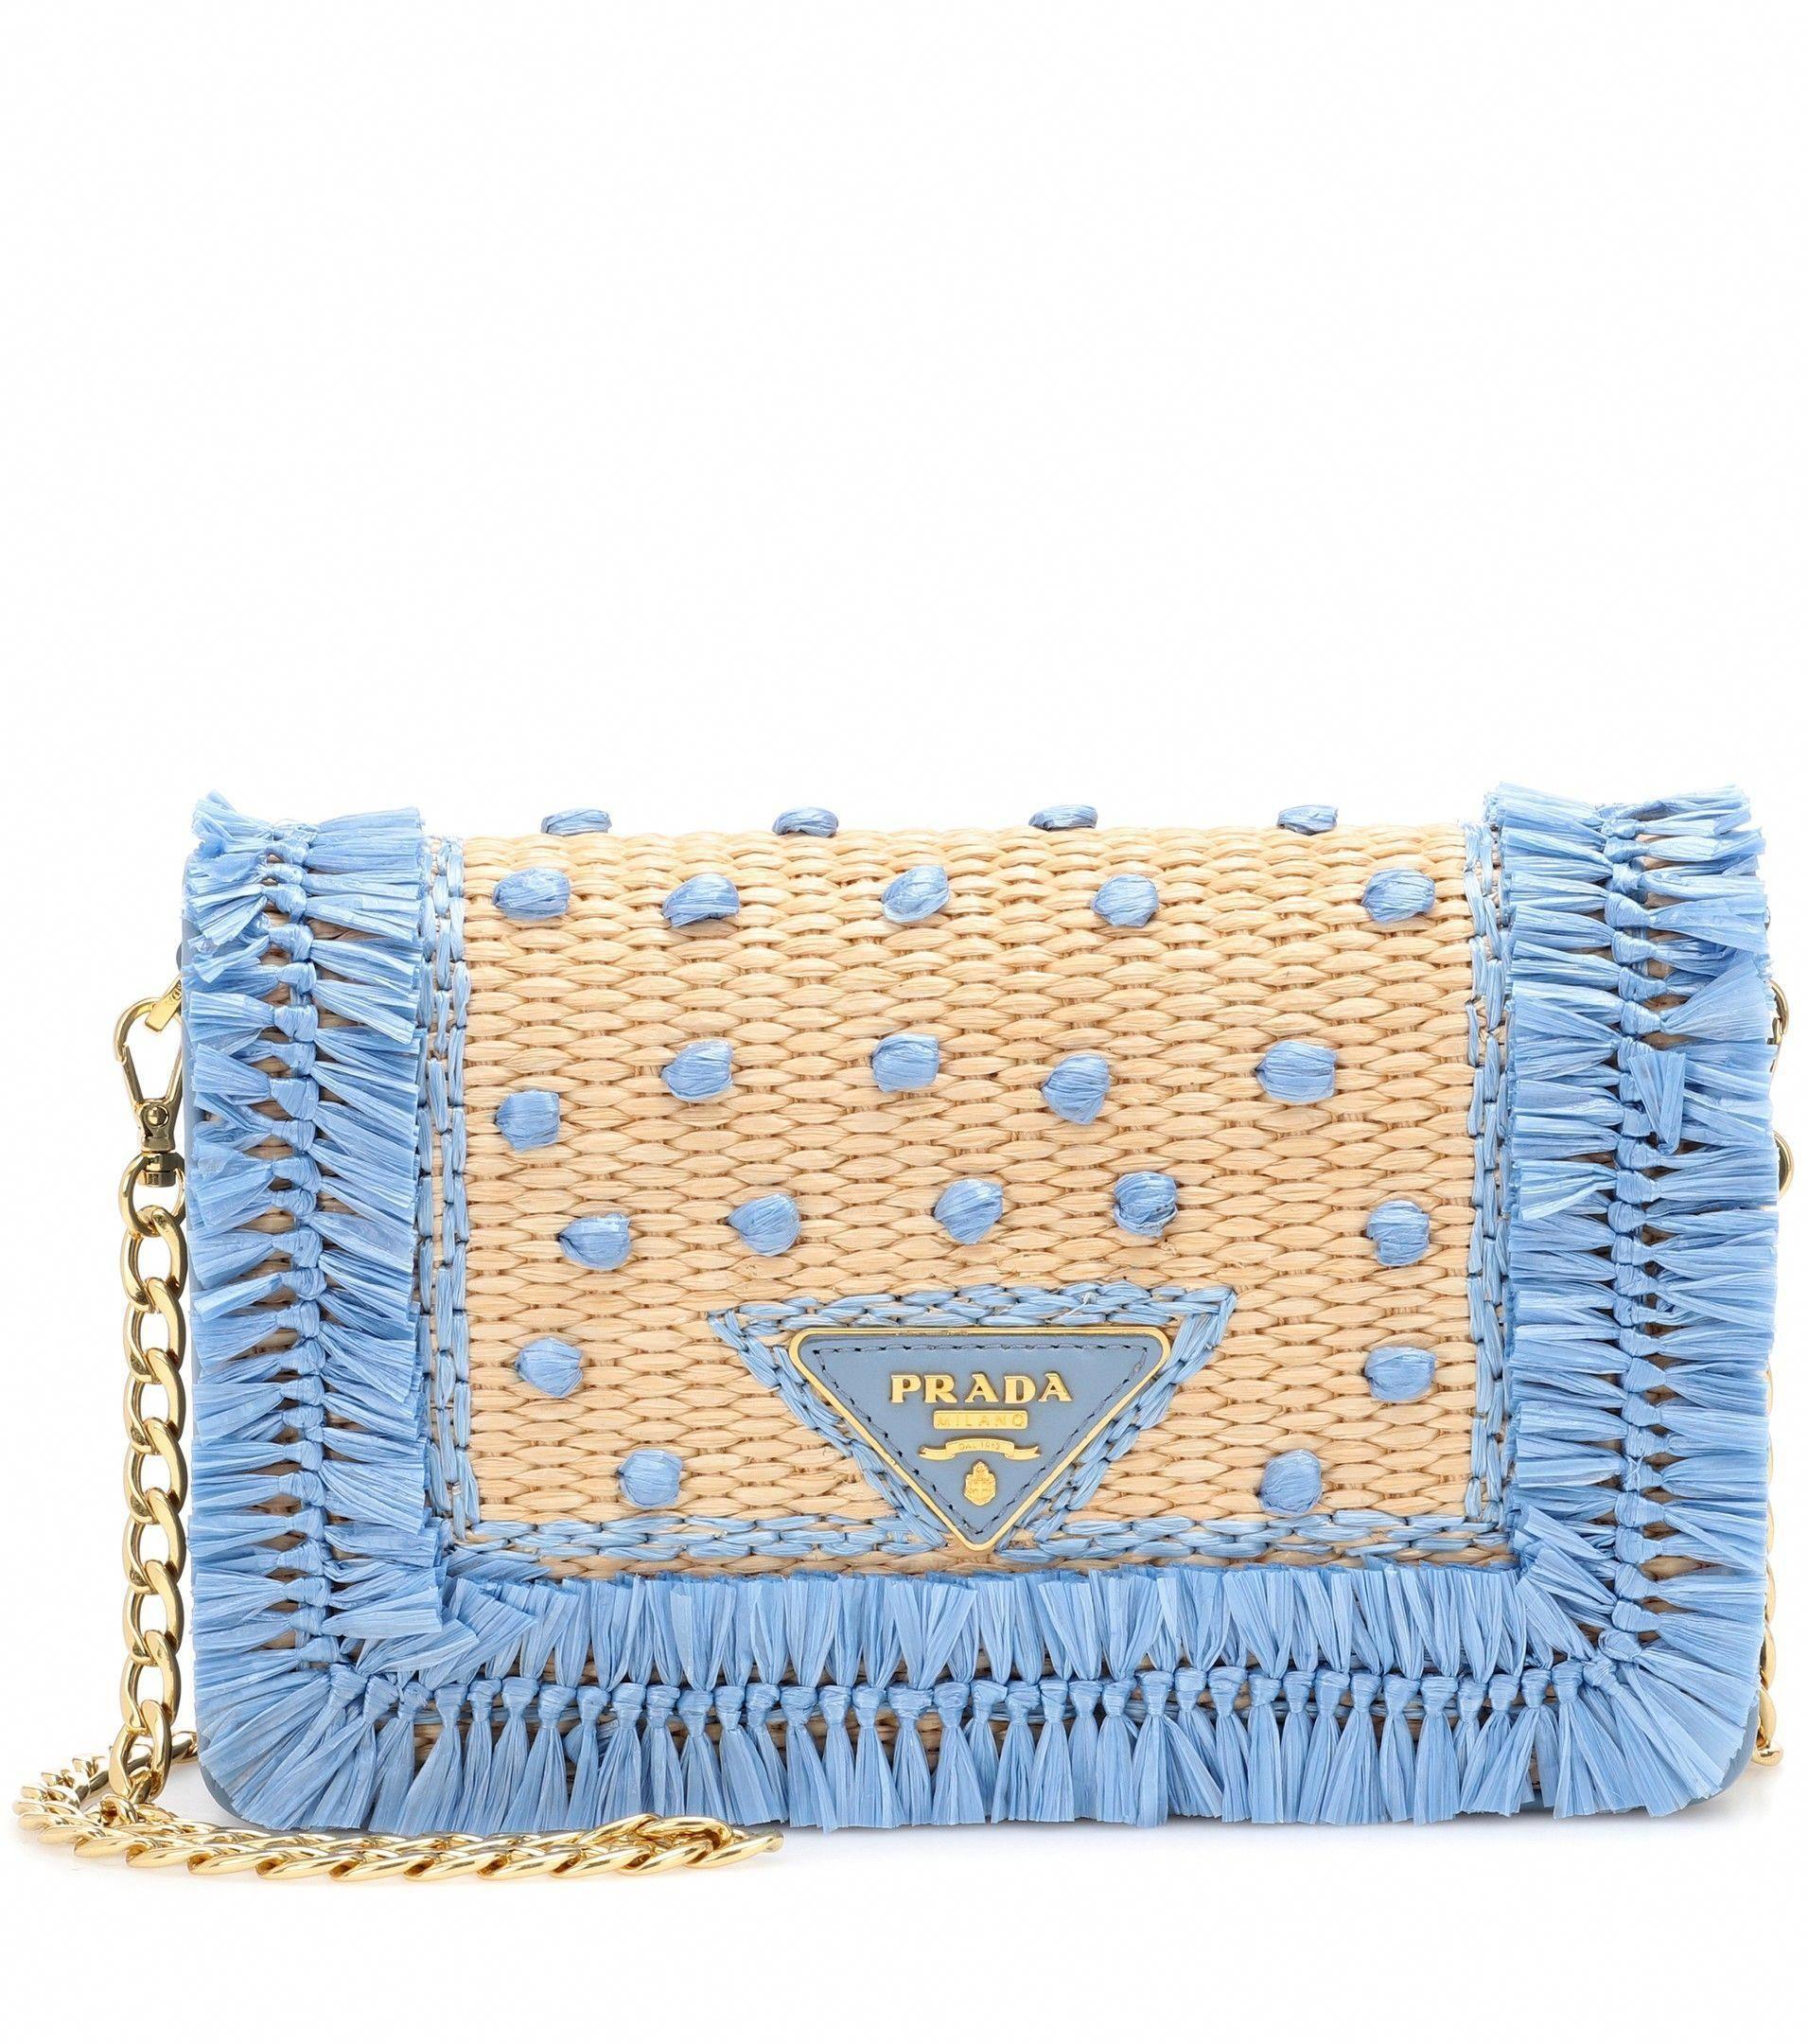 e369cfb307c1 Leather And Raffia Shoulder Bag   Prada - mytheresa.com - Sale! Up to 75%  OFF! Shop at Stylizio for women's and men's designer handbags, luxury  sunglasses, ...